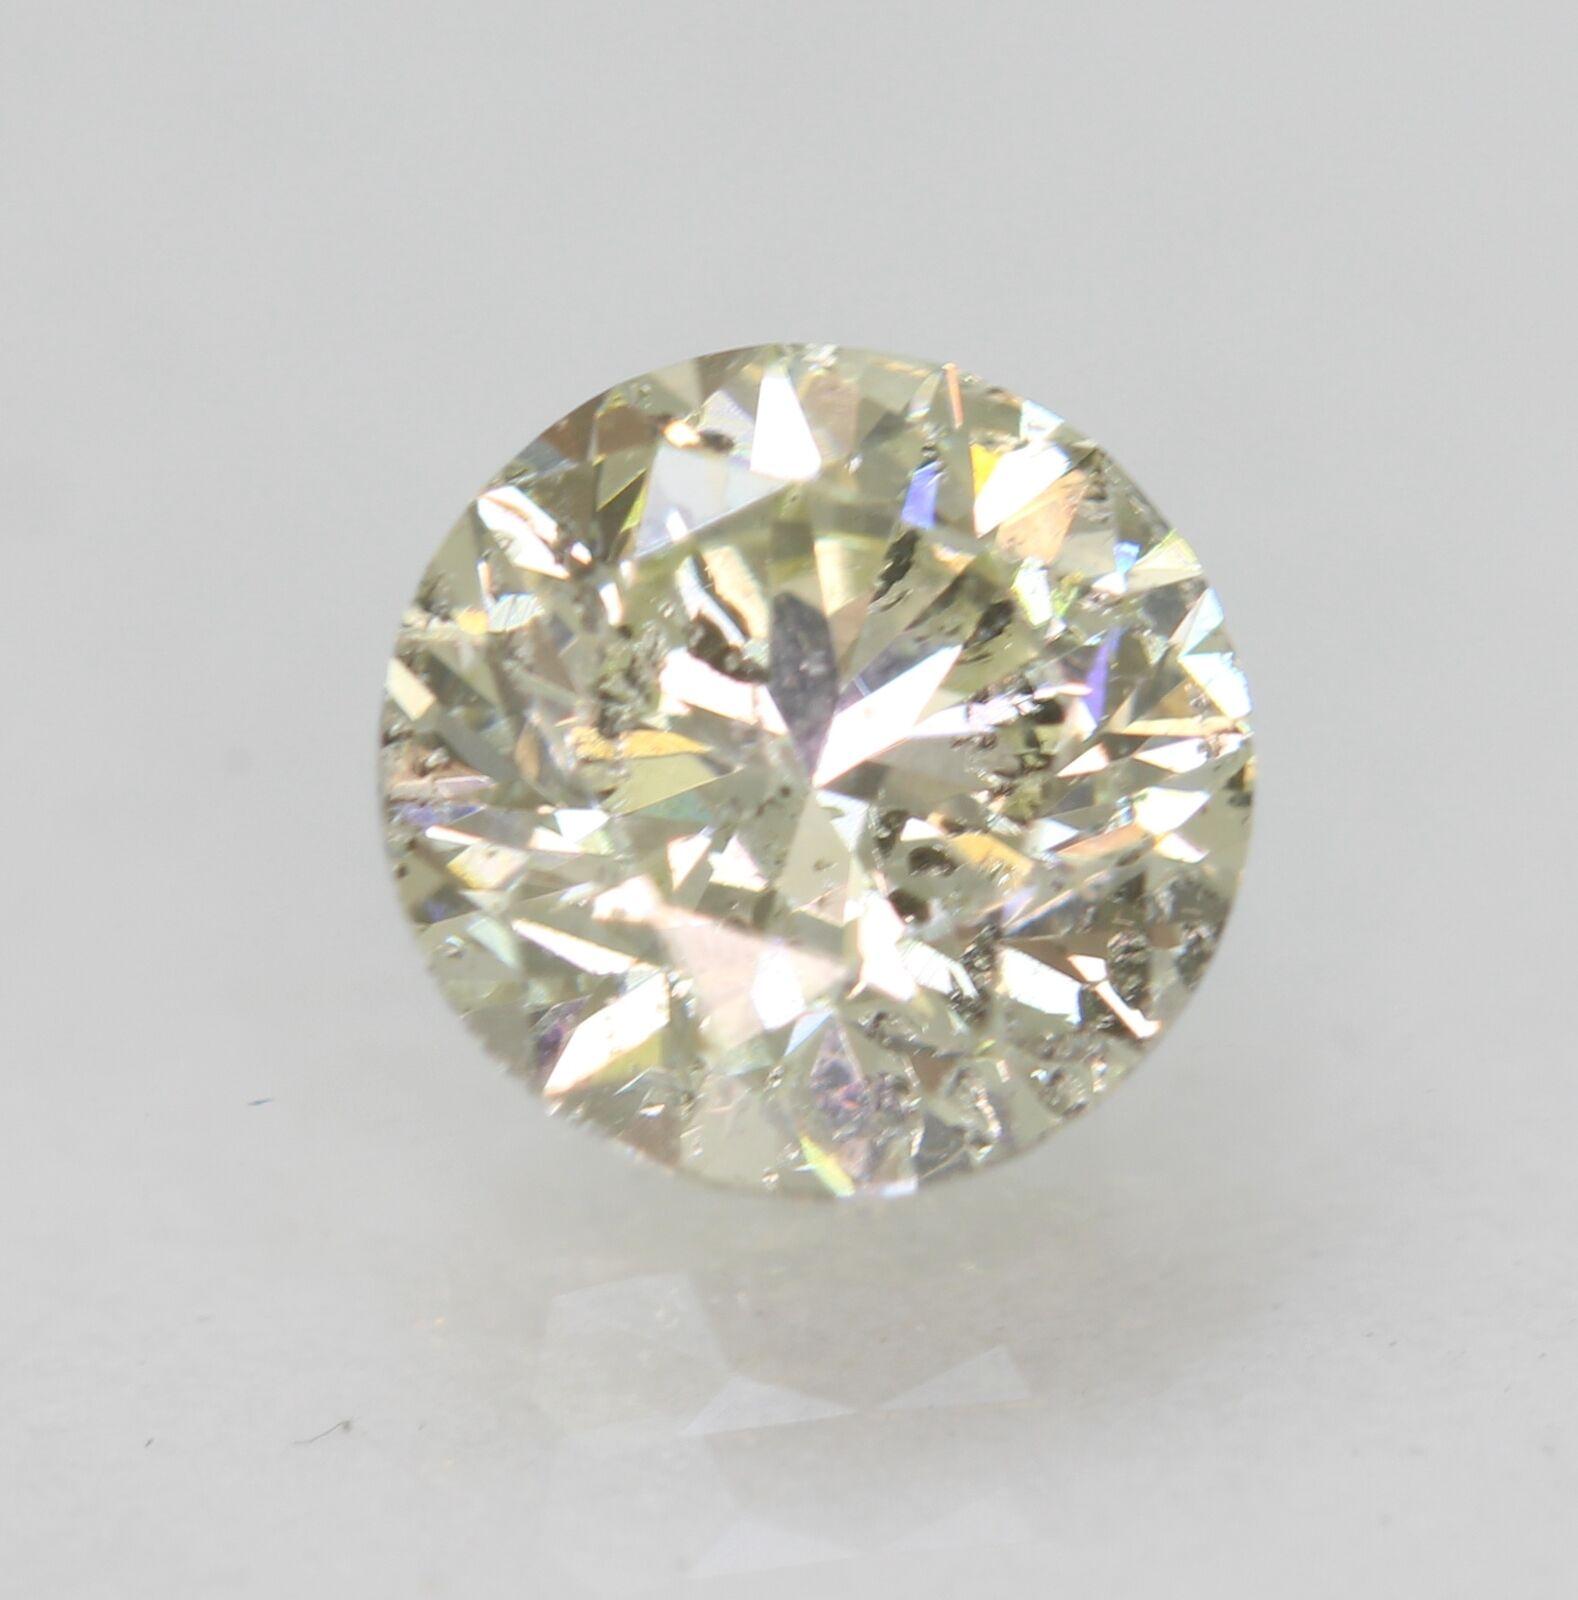 Certified 1.15 Carat H SI3 Round Brilliant Natural Loose Diamond 6.49mm